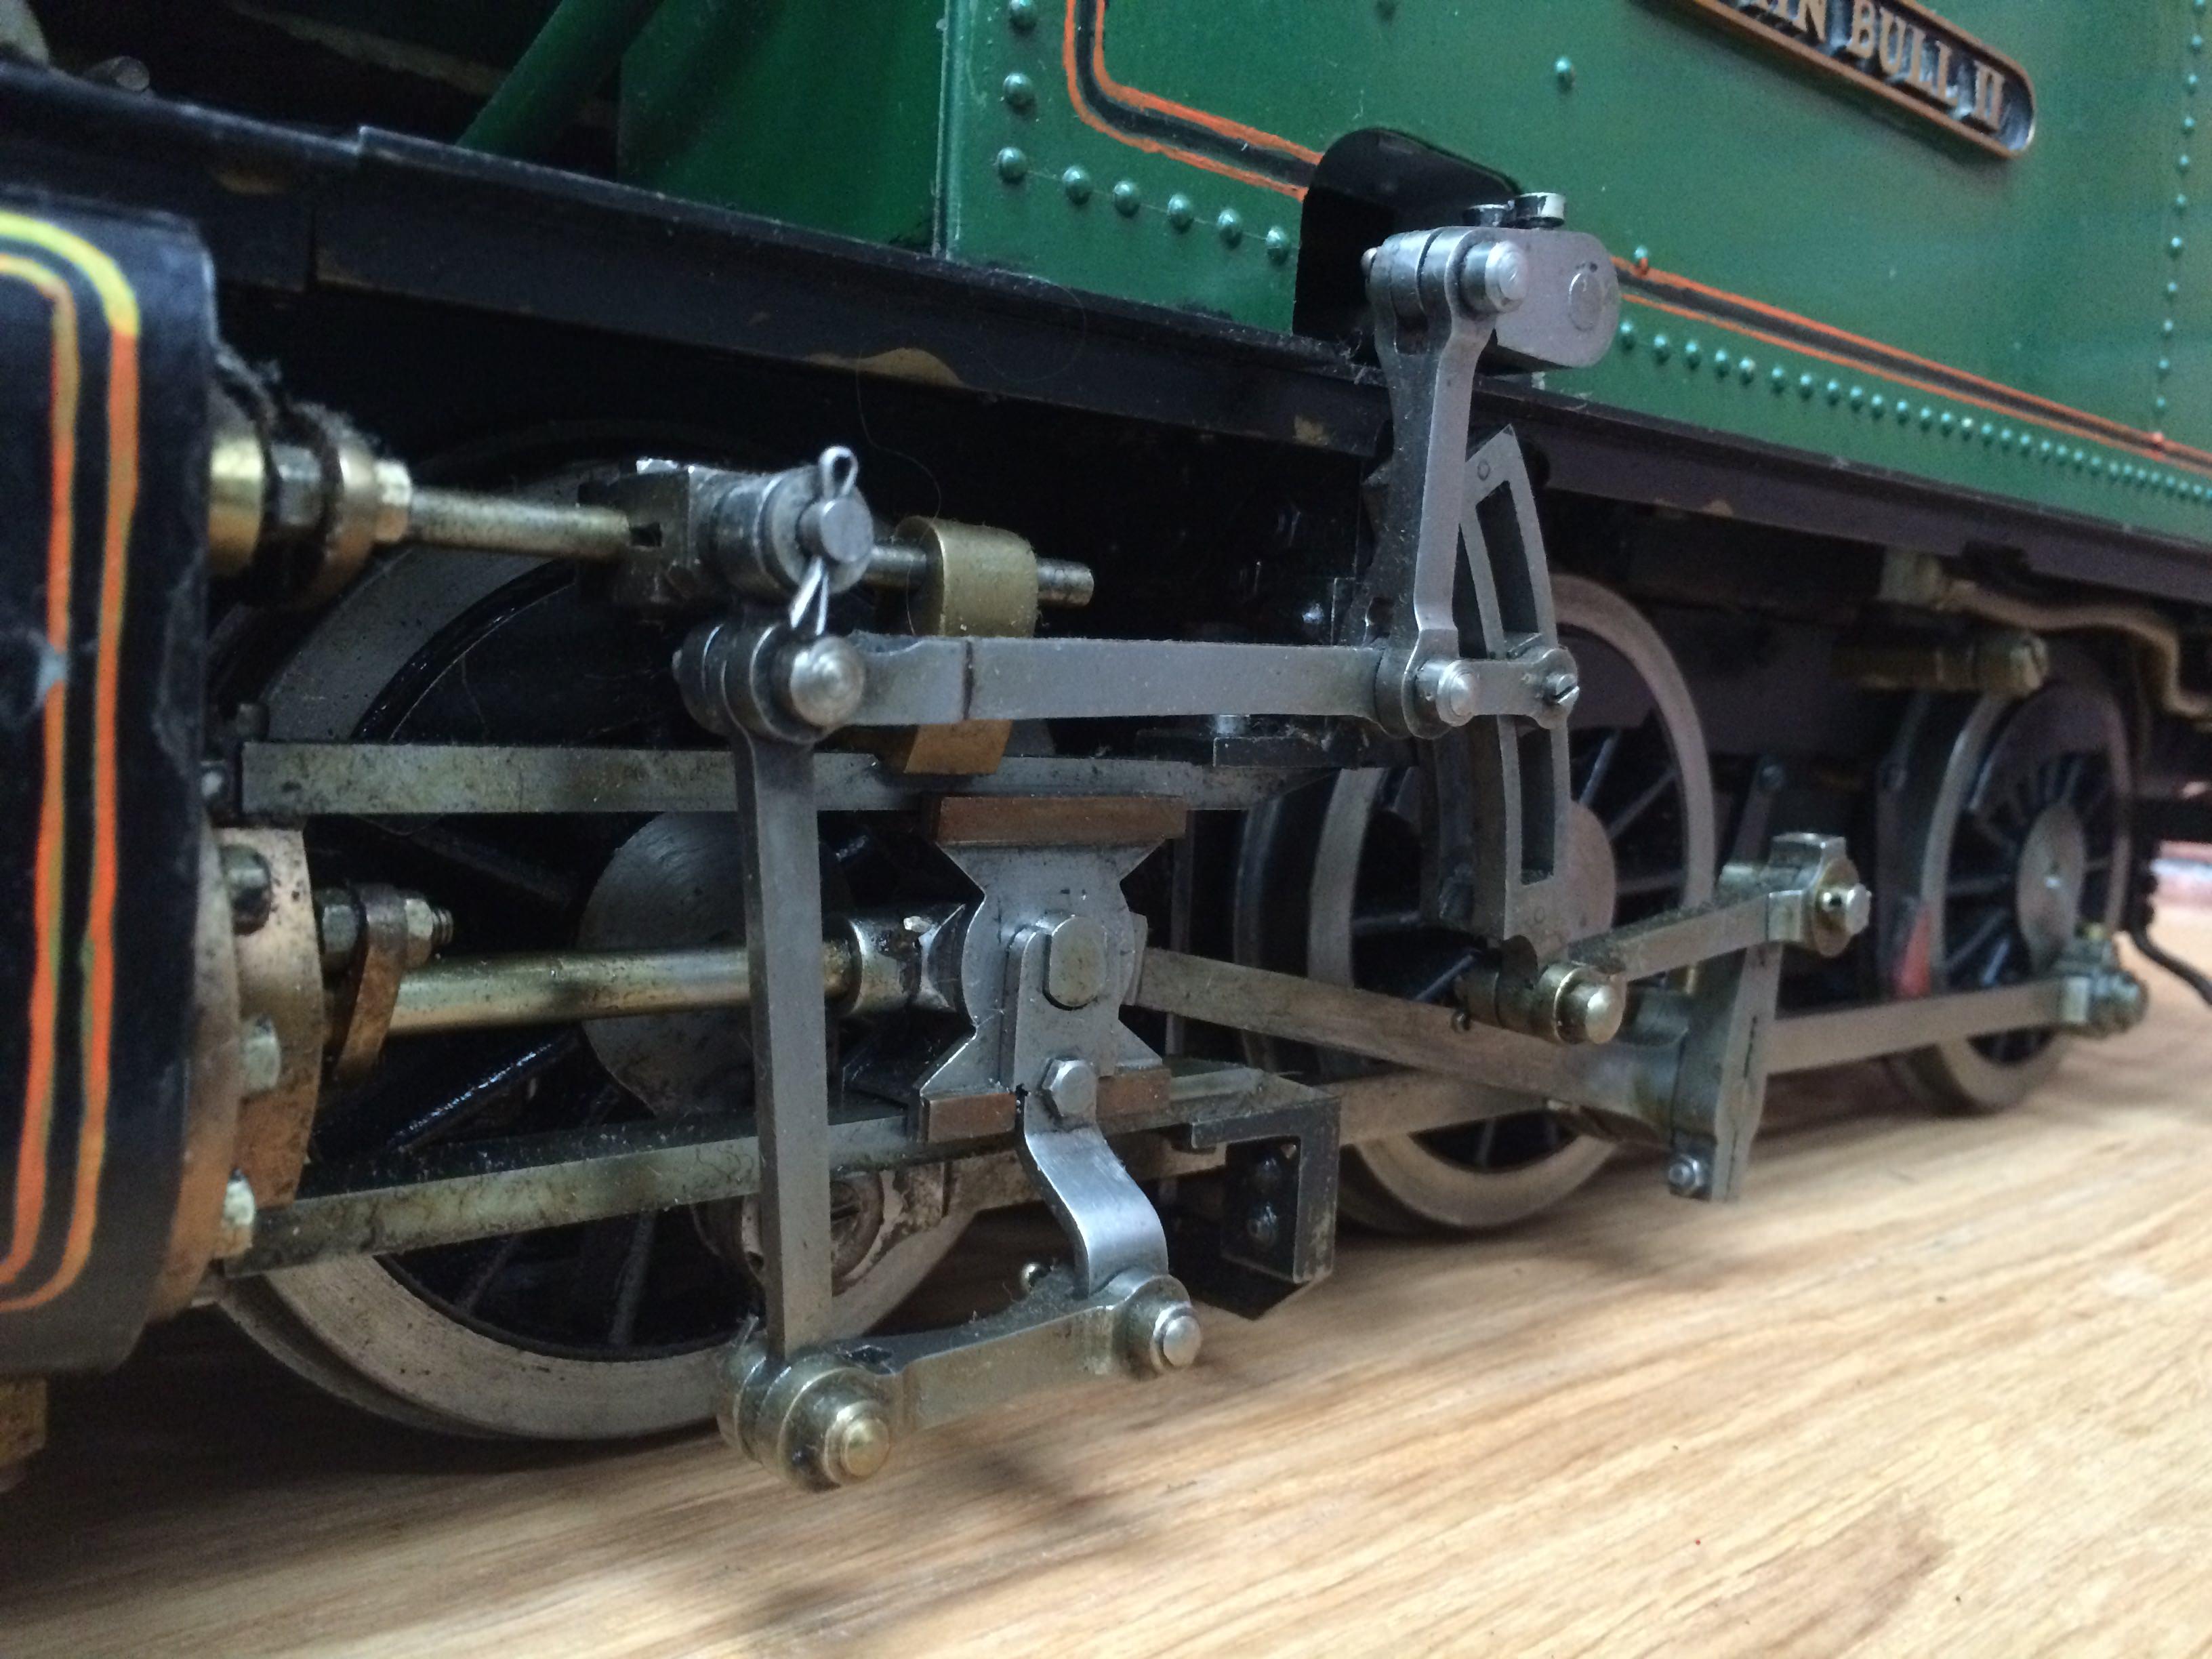 test 3 inch gauge freelance live steam tank engine for sale 03